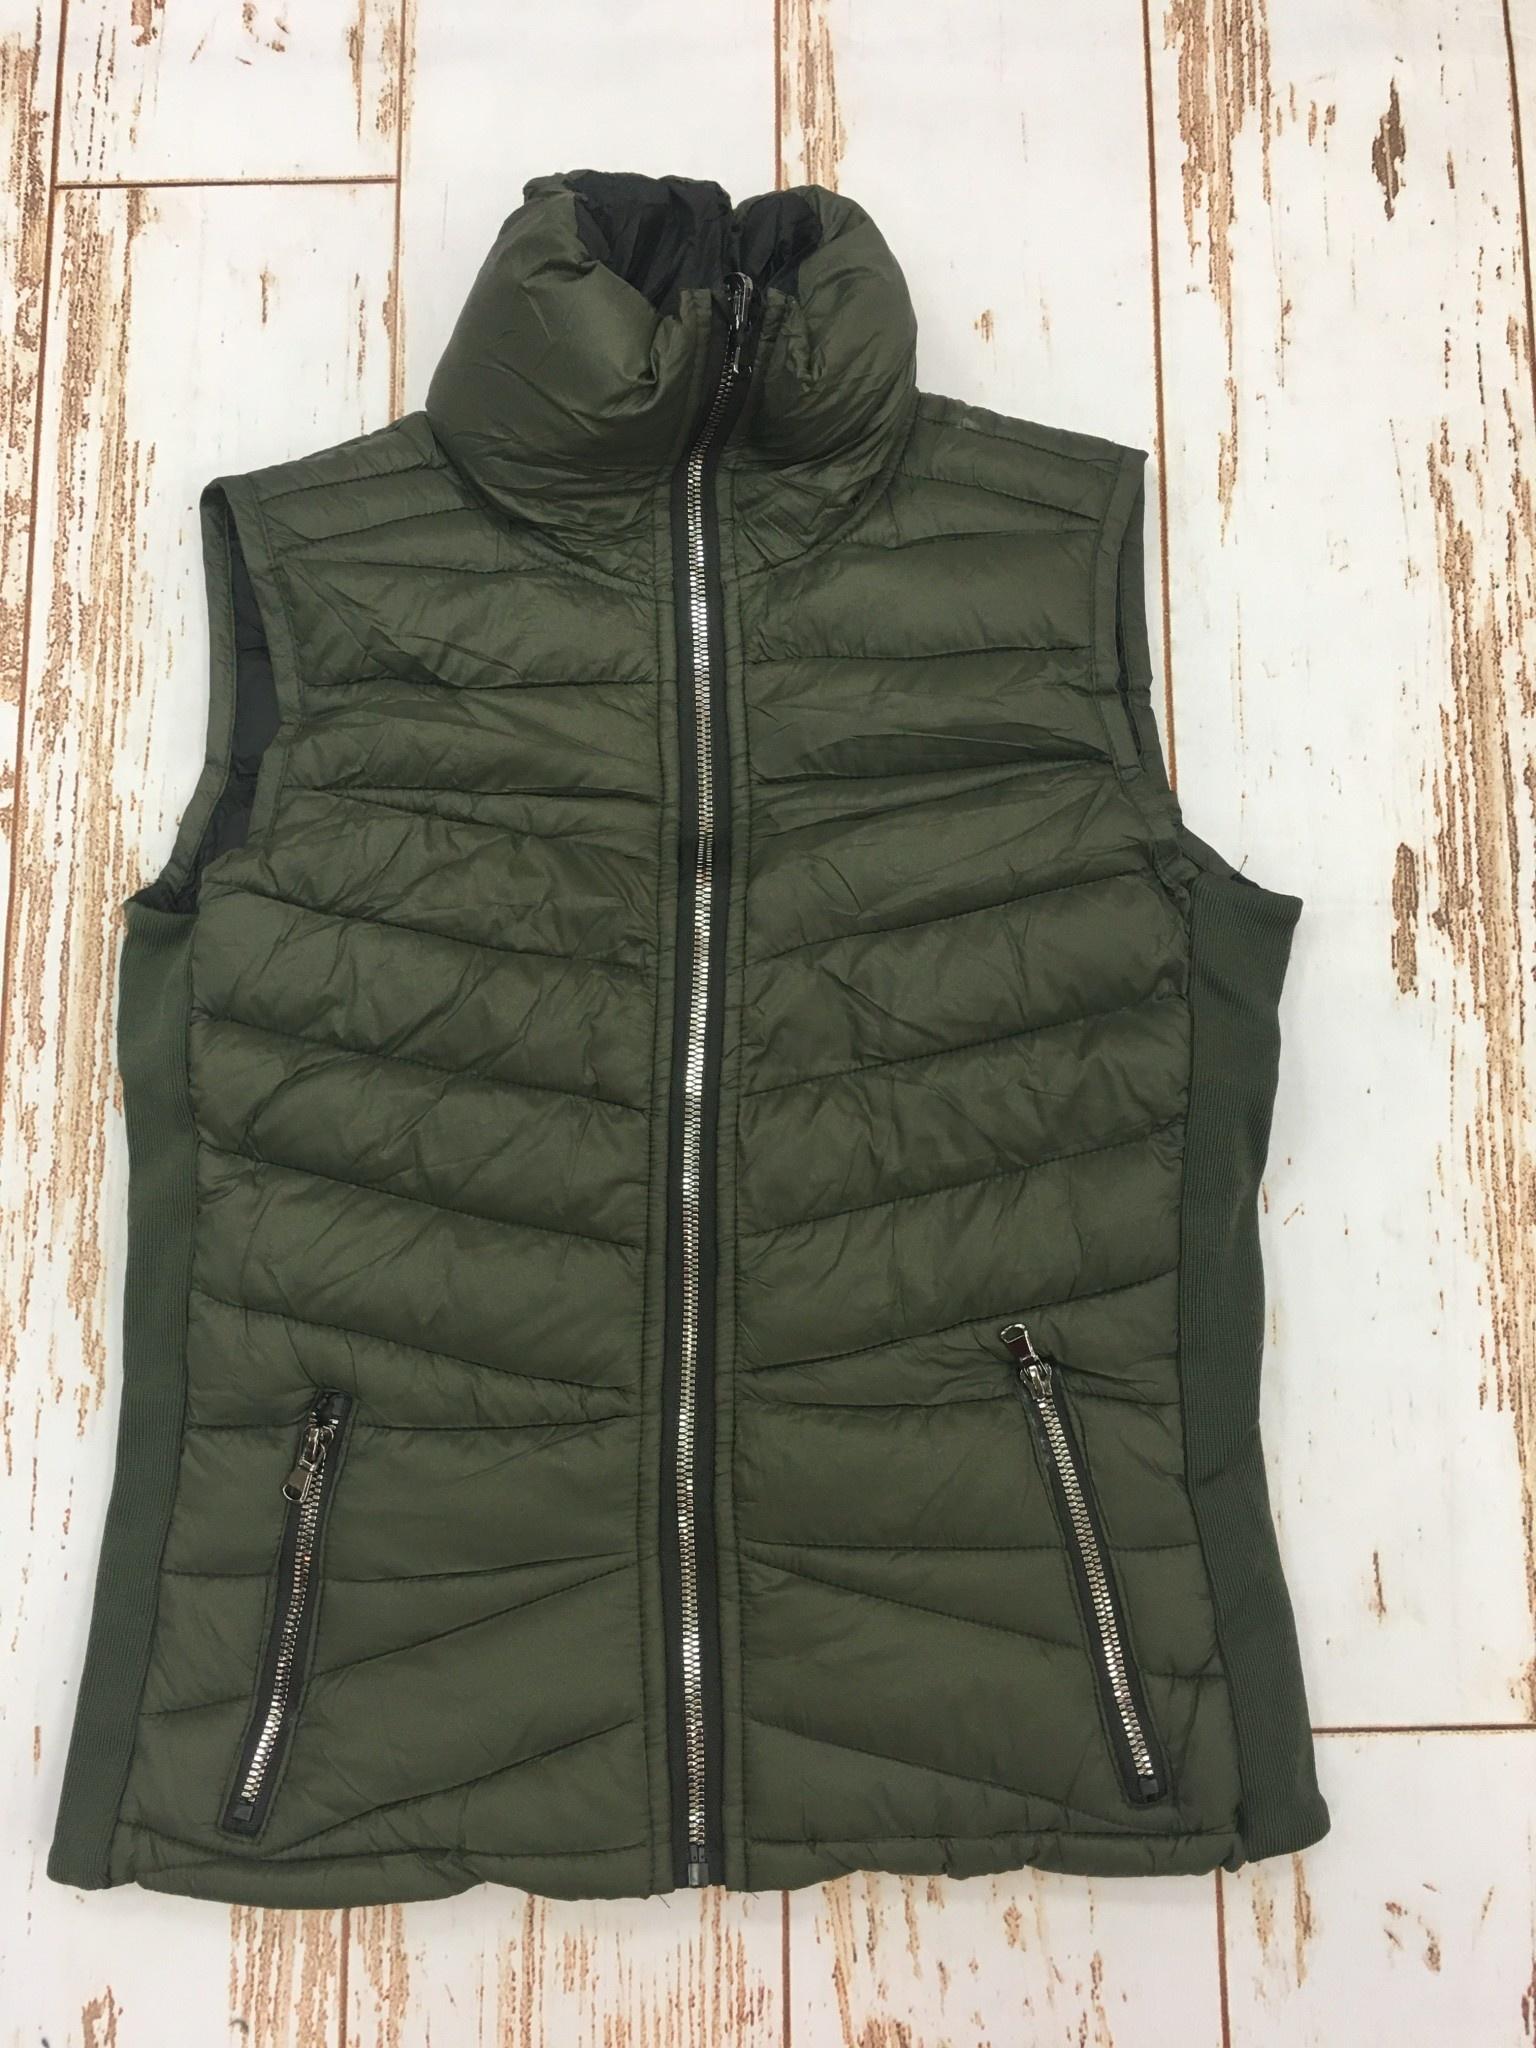 Ashley Clothing Reversible Olive/Black Vest